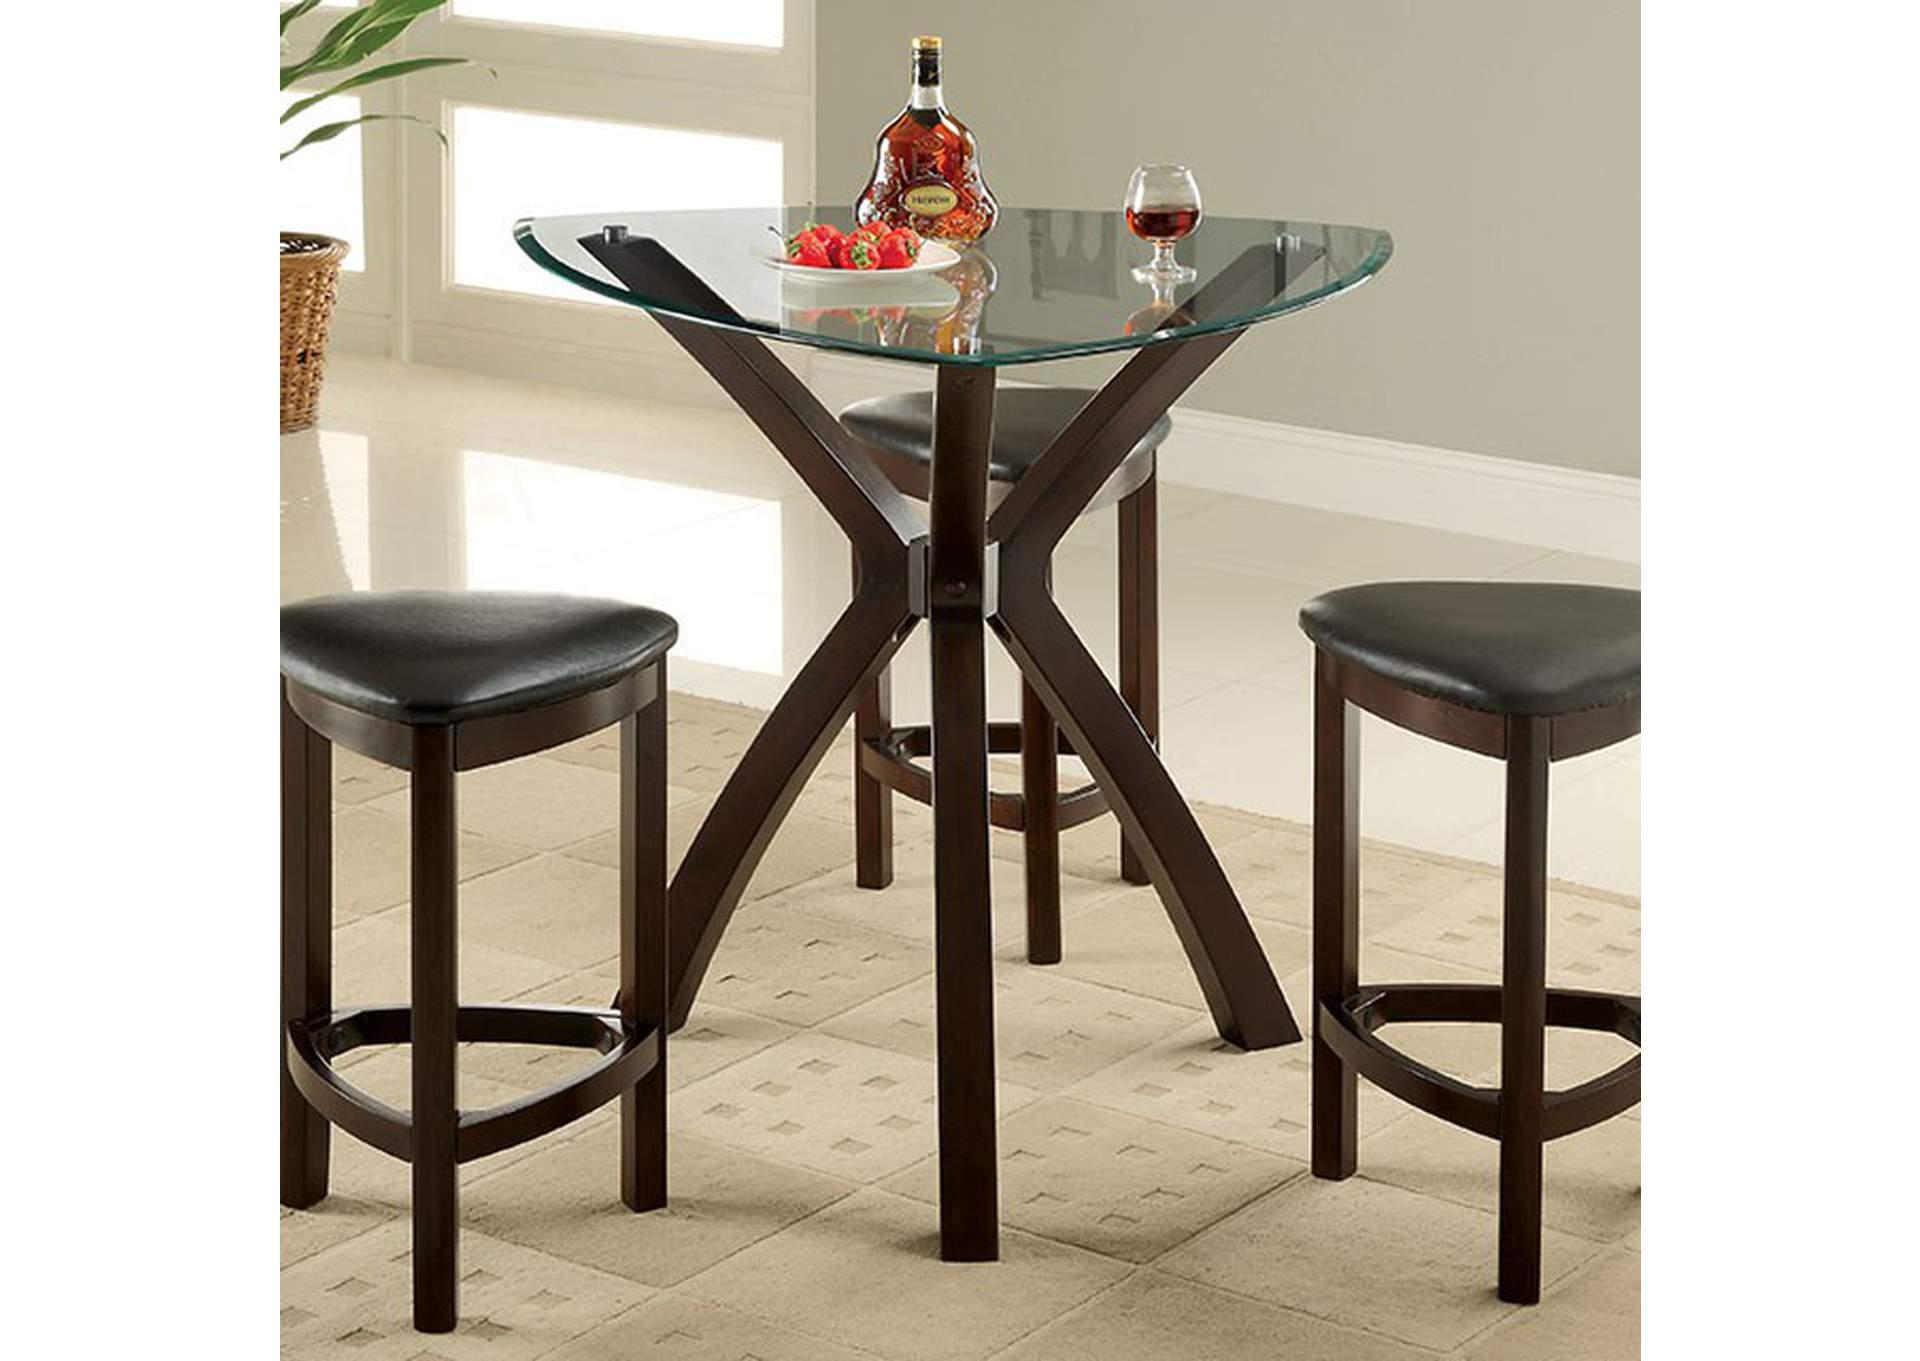 Xanti 4 Piece Triangle Counter Table Set Sweet Home Furniture By Niposul